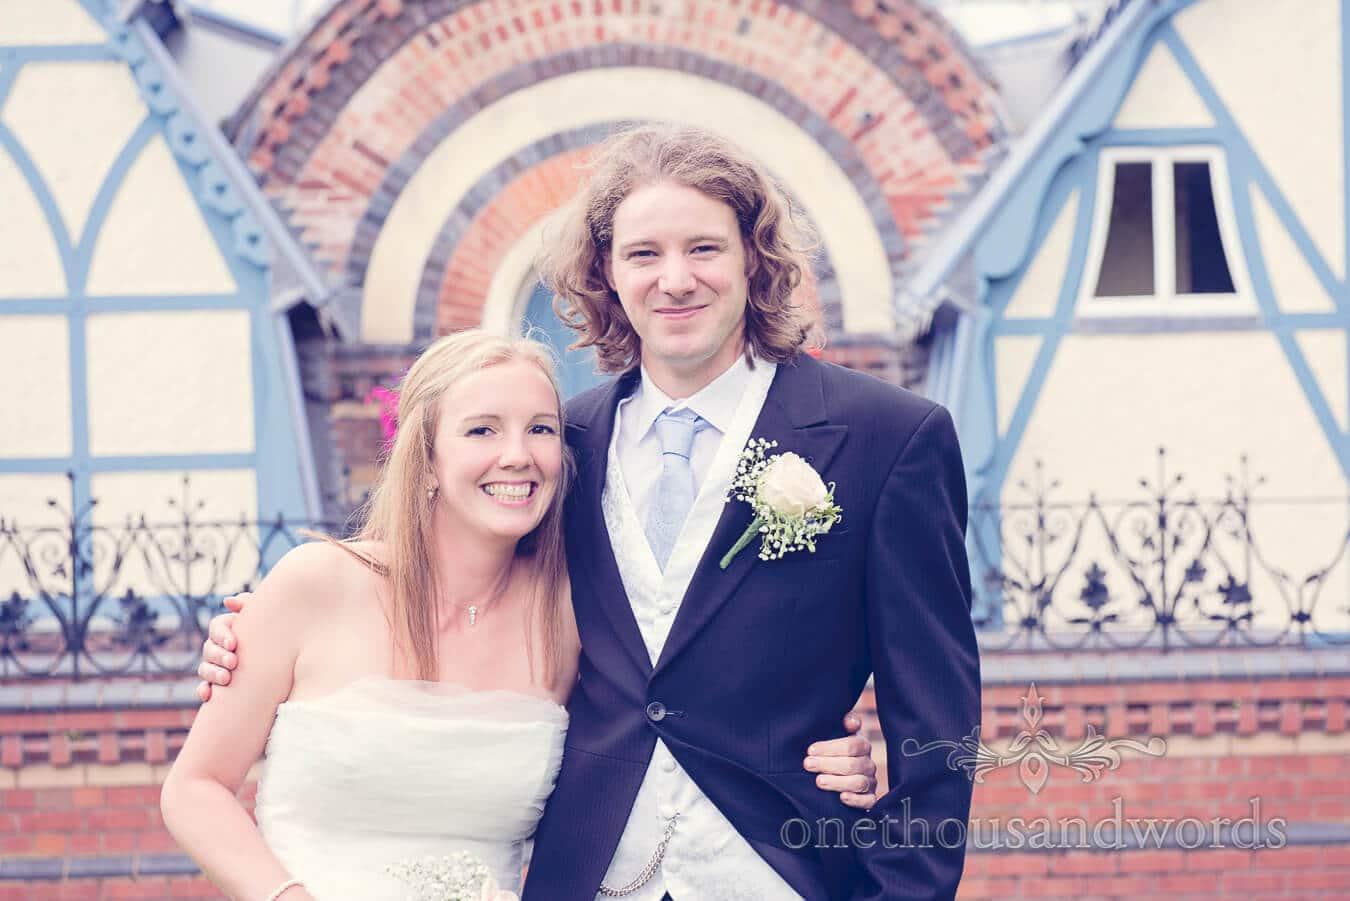 Bride and groom portrait outside Tenbury Wells Pump Room wedding venue